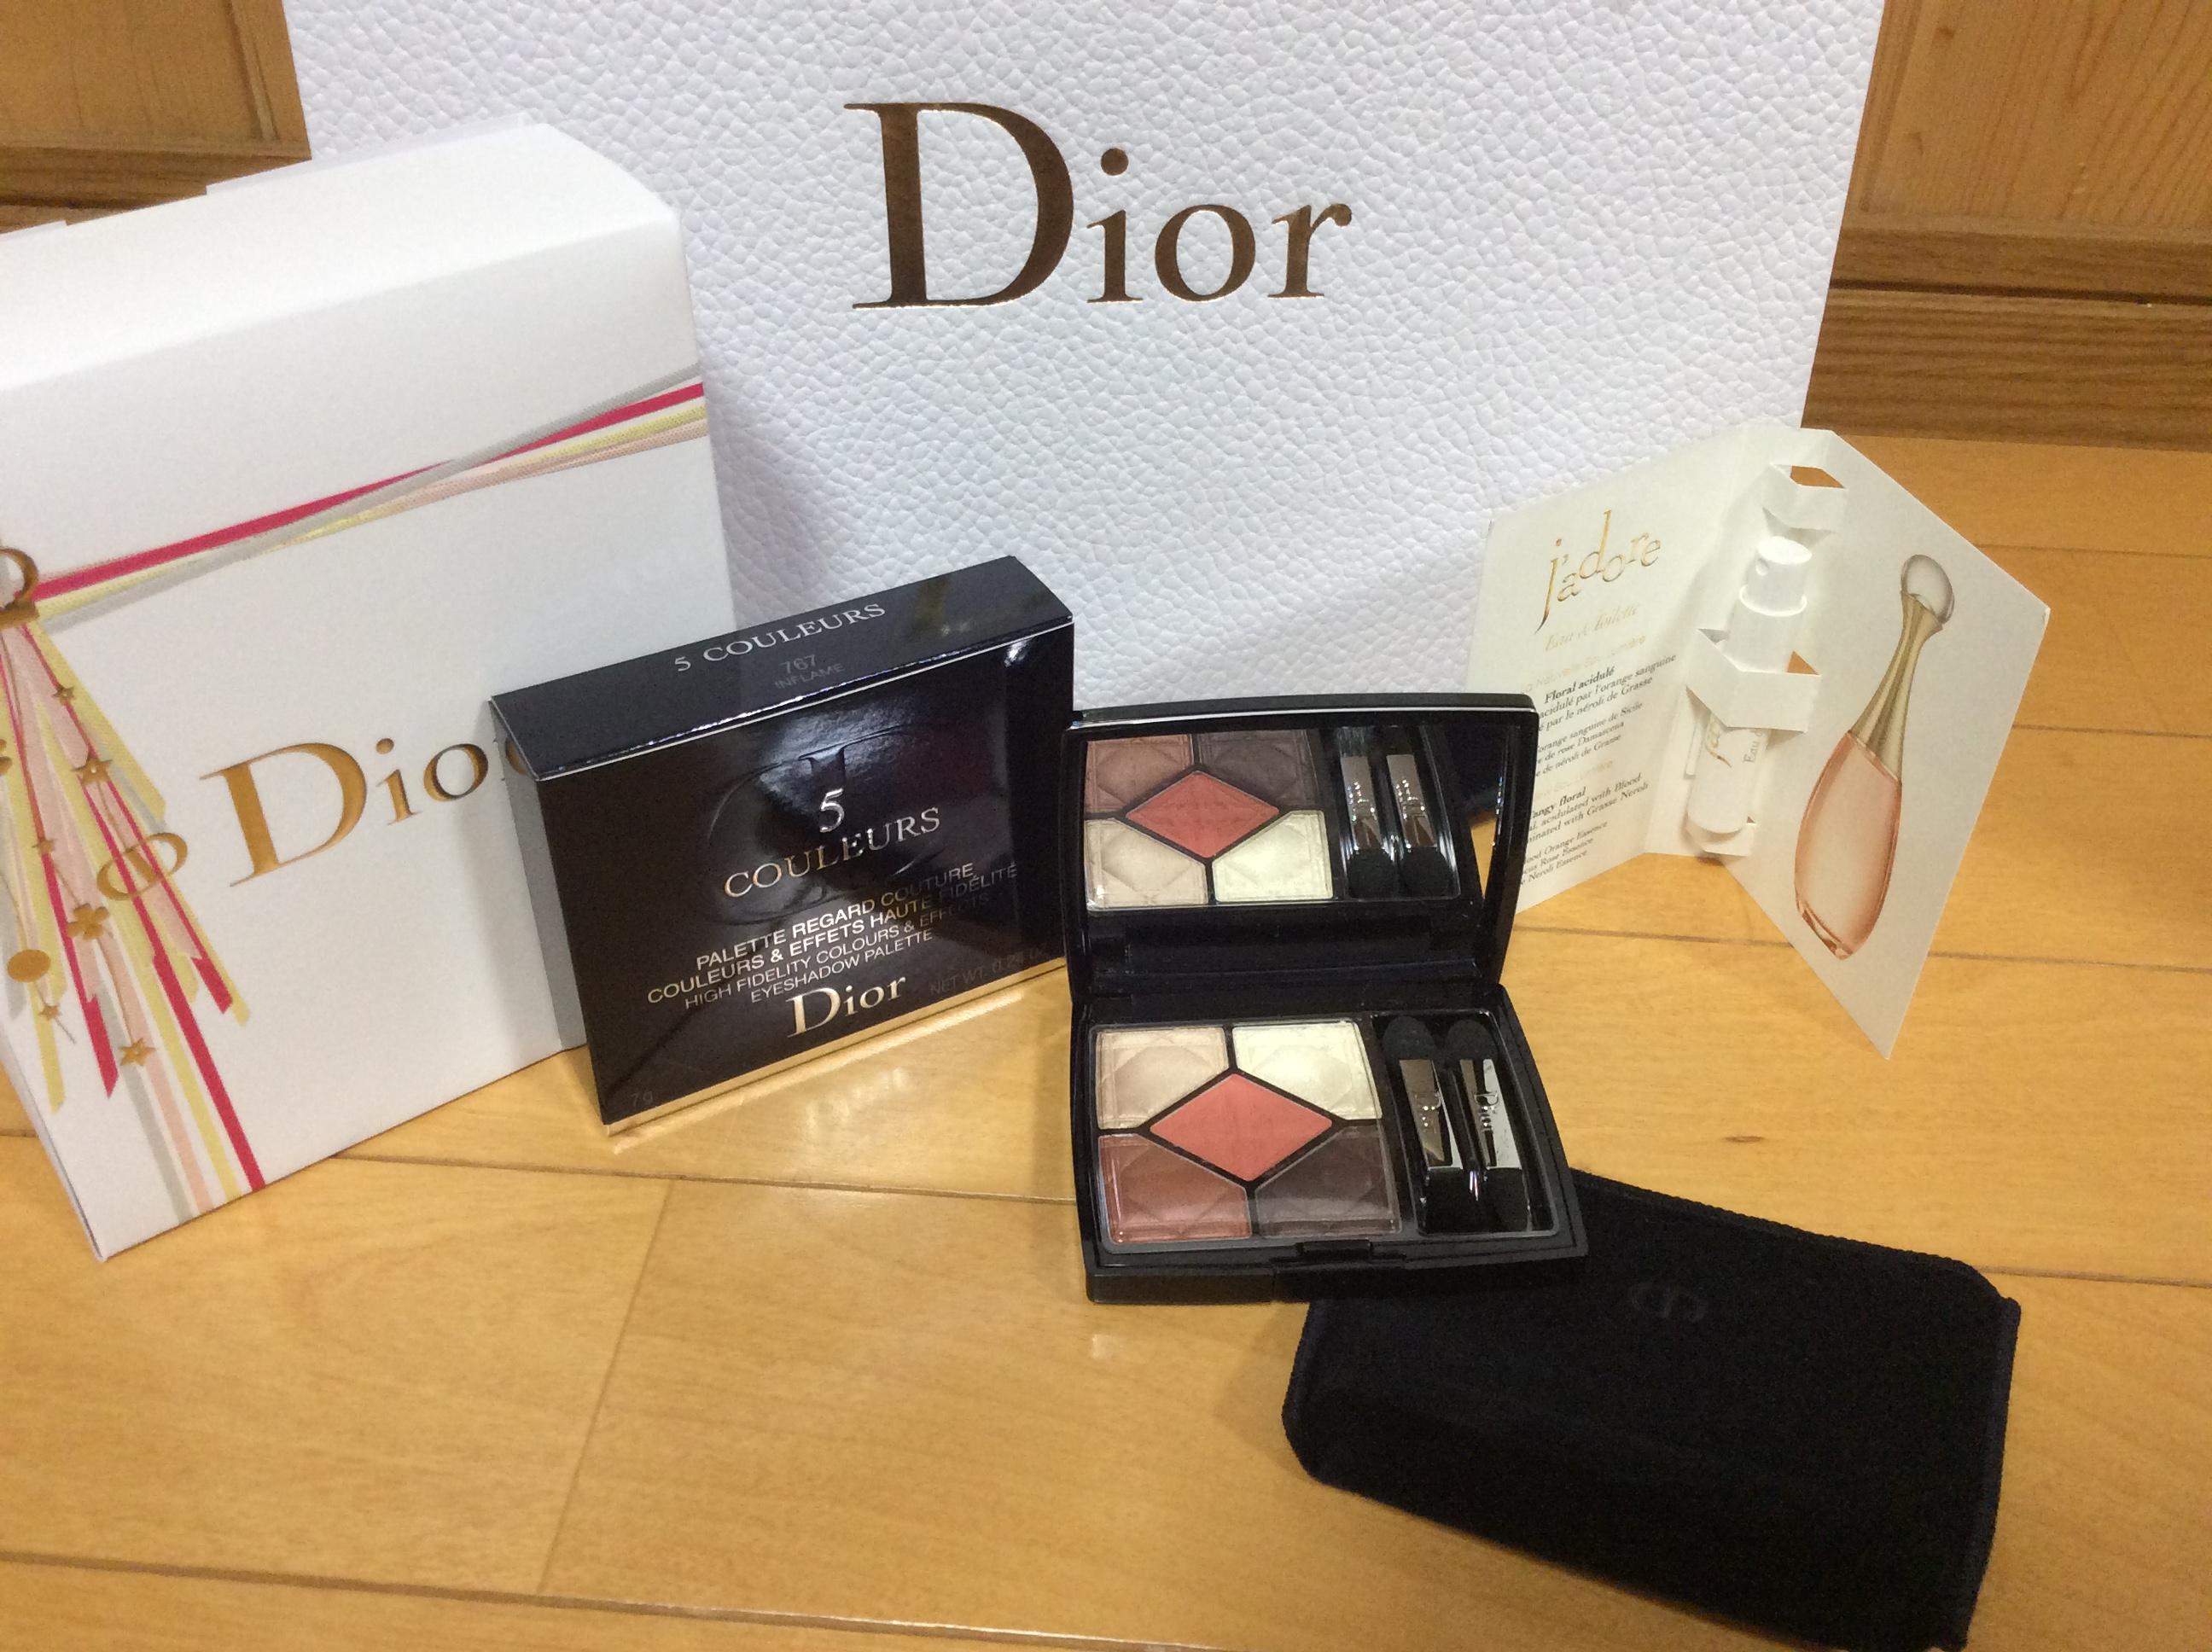 Dior サンク クルール クリスマス ラッピング ディオール ジャドール オールミエール 2018